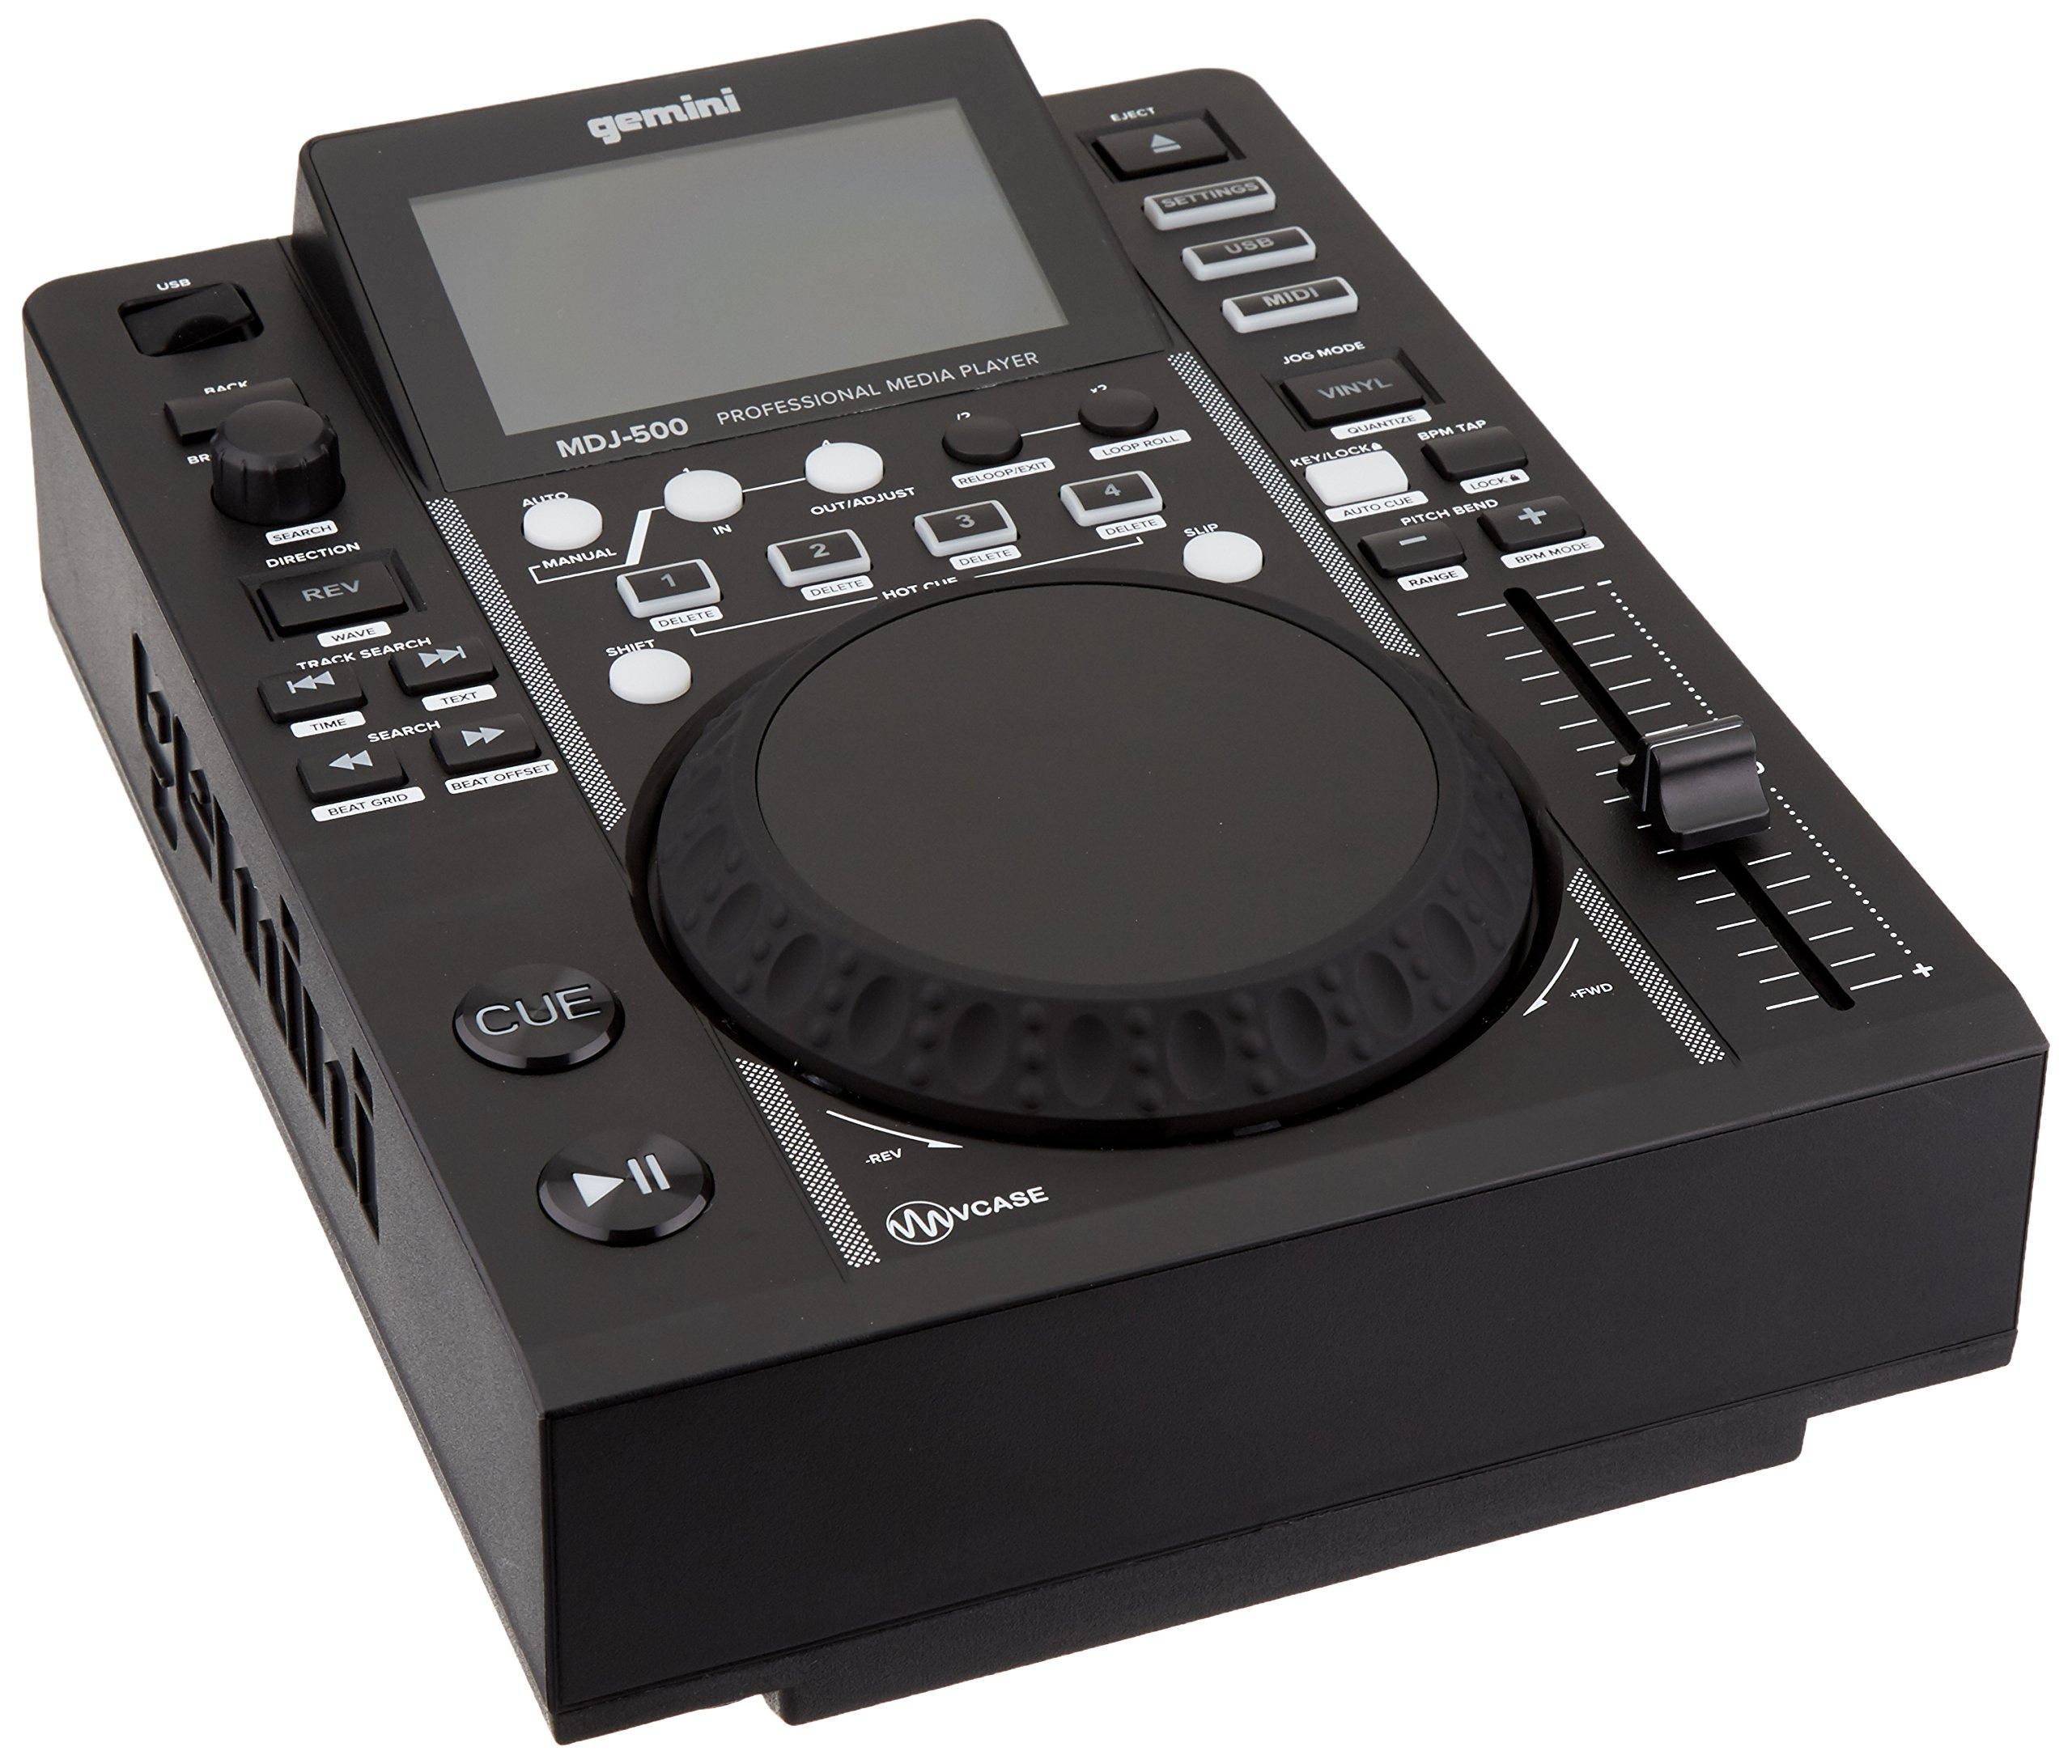 Gemini MDJ-500 | Professional DJ USB Media Player by Gemini Kaleidoscopes